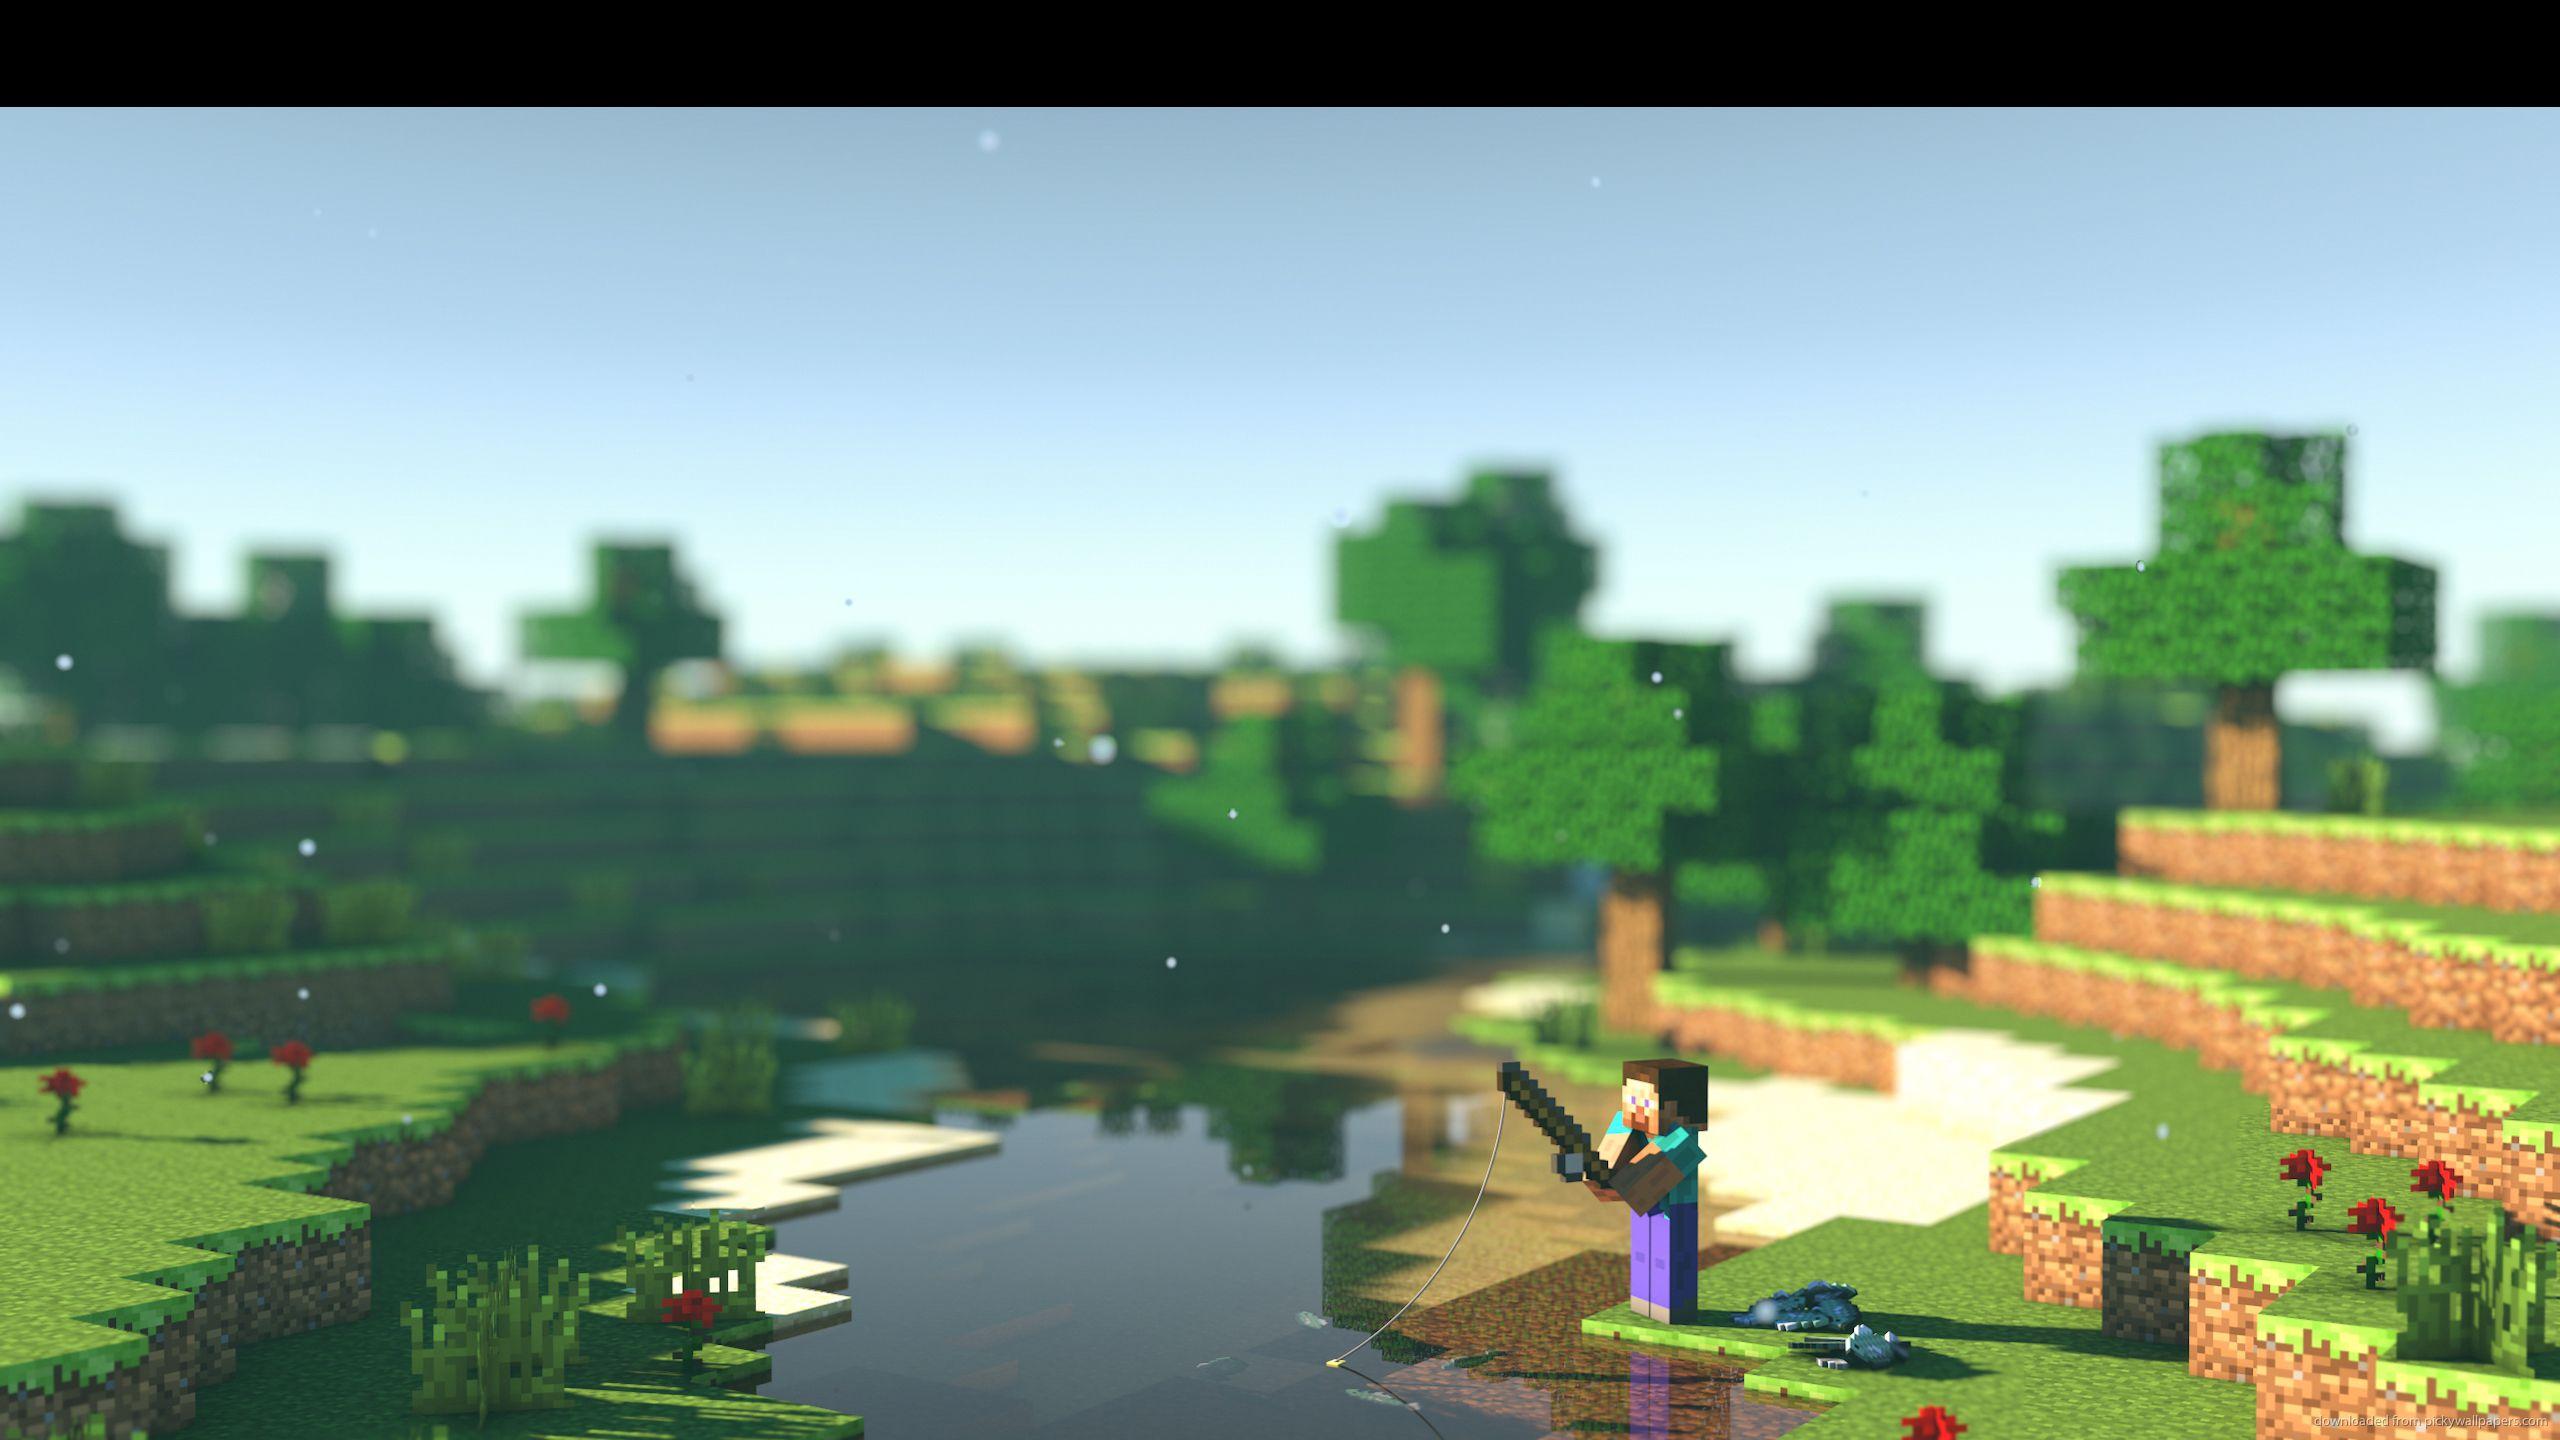 Minecraft Youtube Channel Art Wallpaper - Background Minecraft Youtube Banner - HD Wallpaper